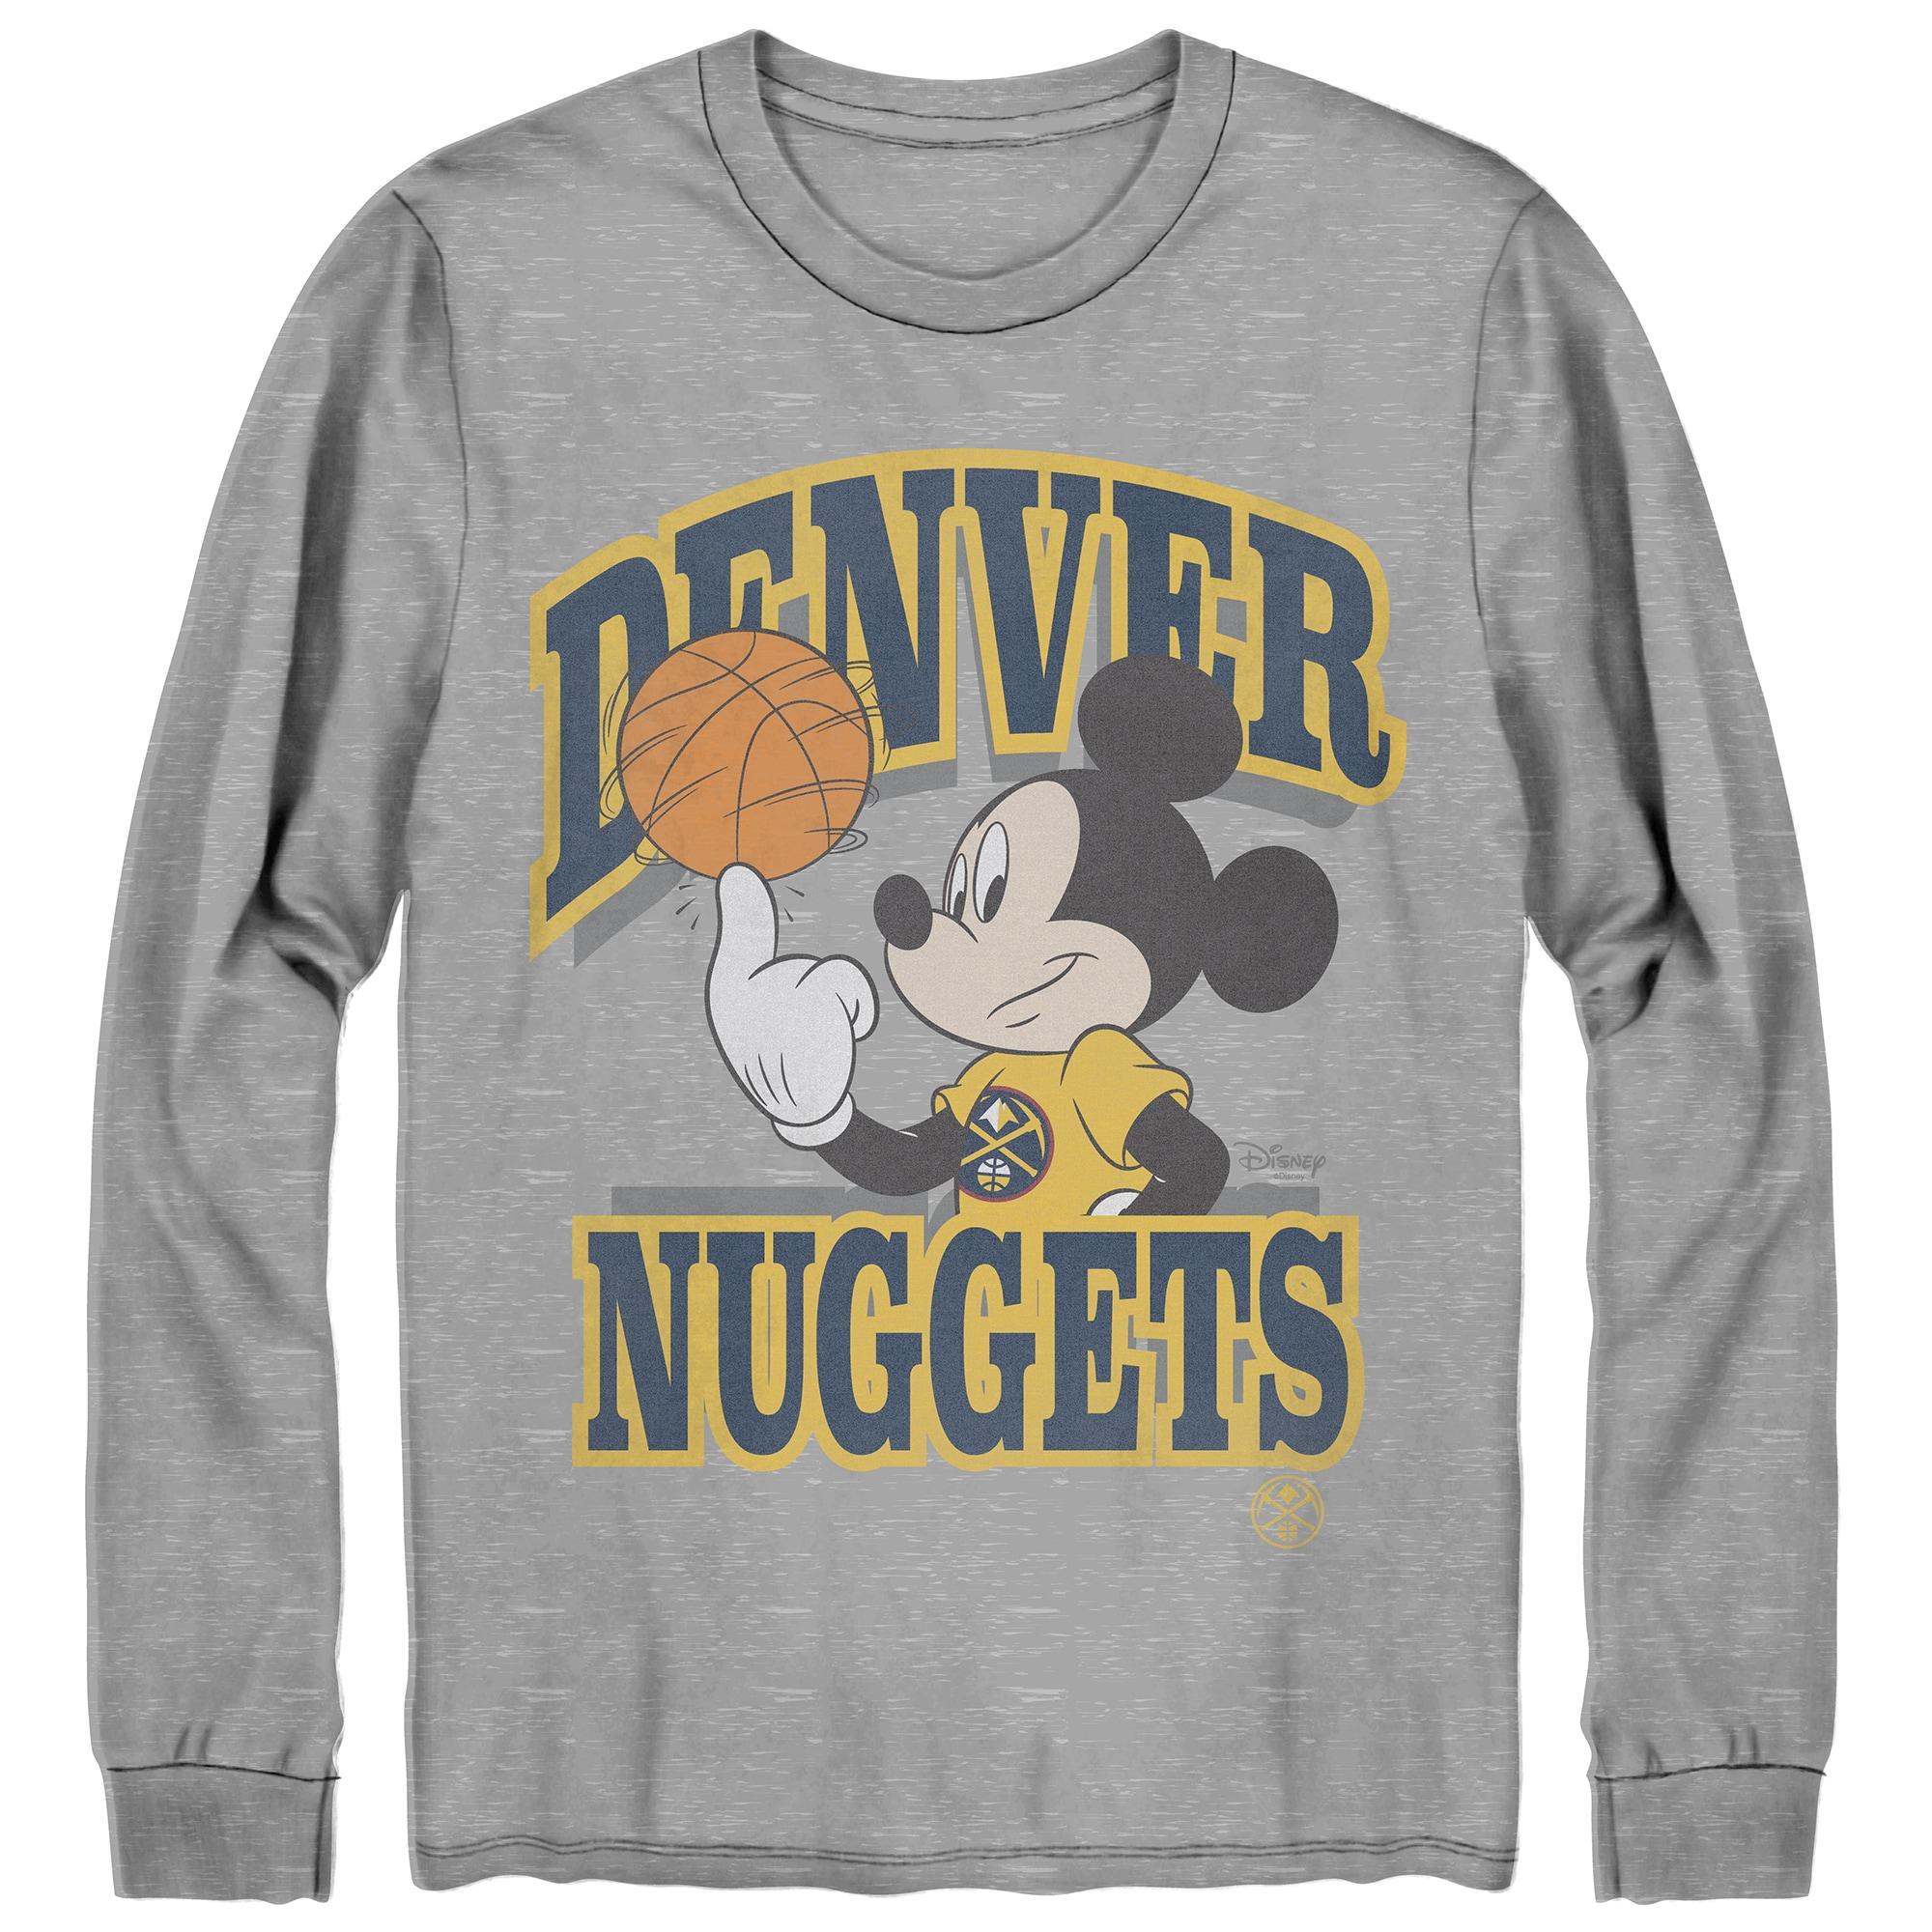 Denver Nuggets Junk Food Disney Mickey Team Spirit Long Sleeve T-Shirt - Gray